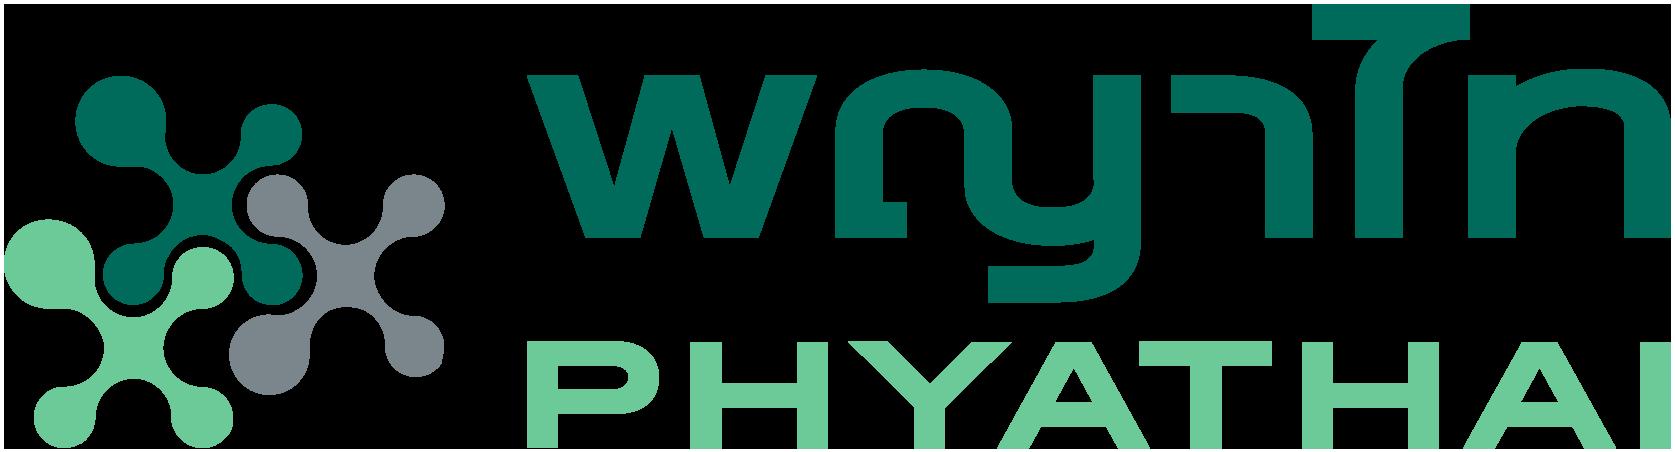 pyt logo